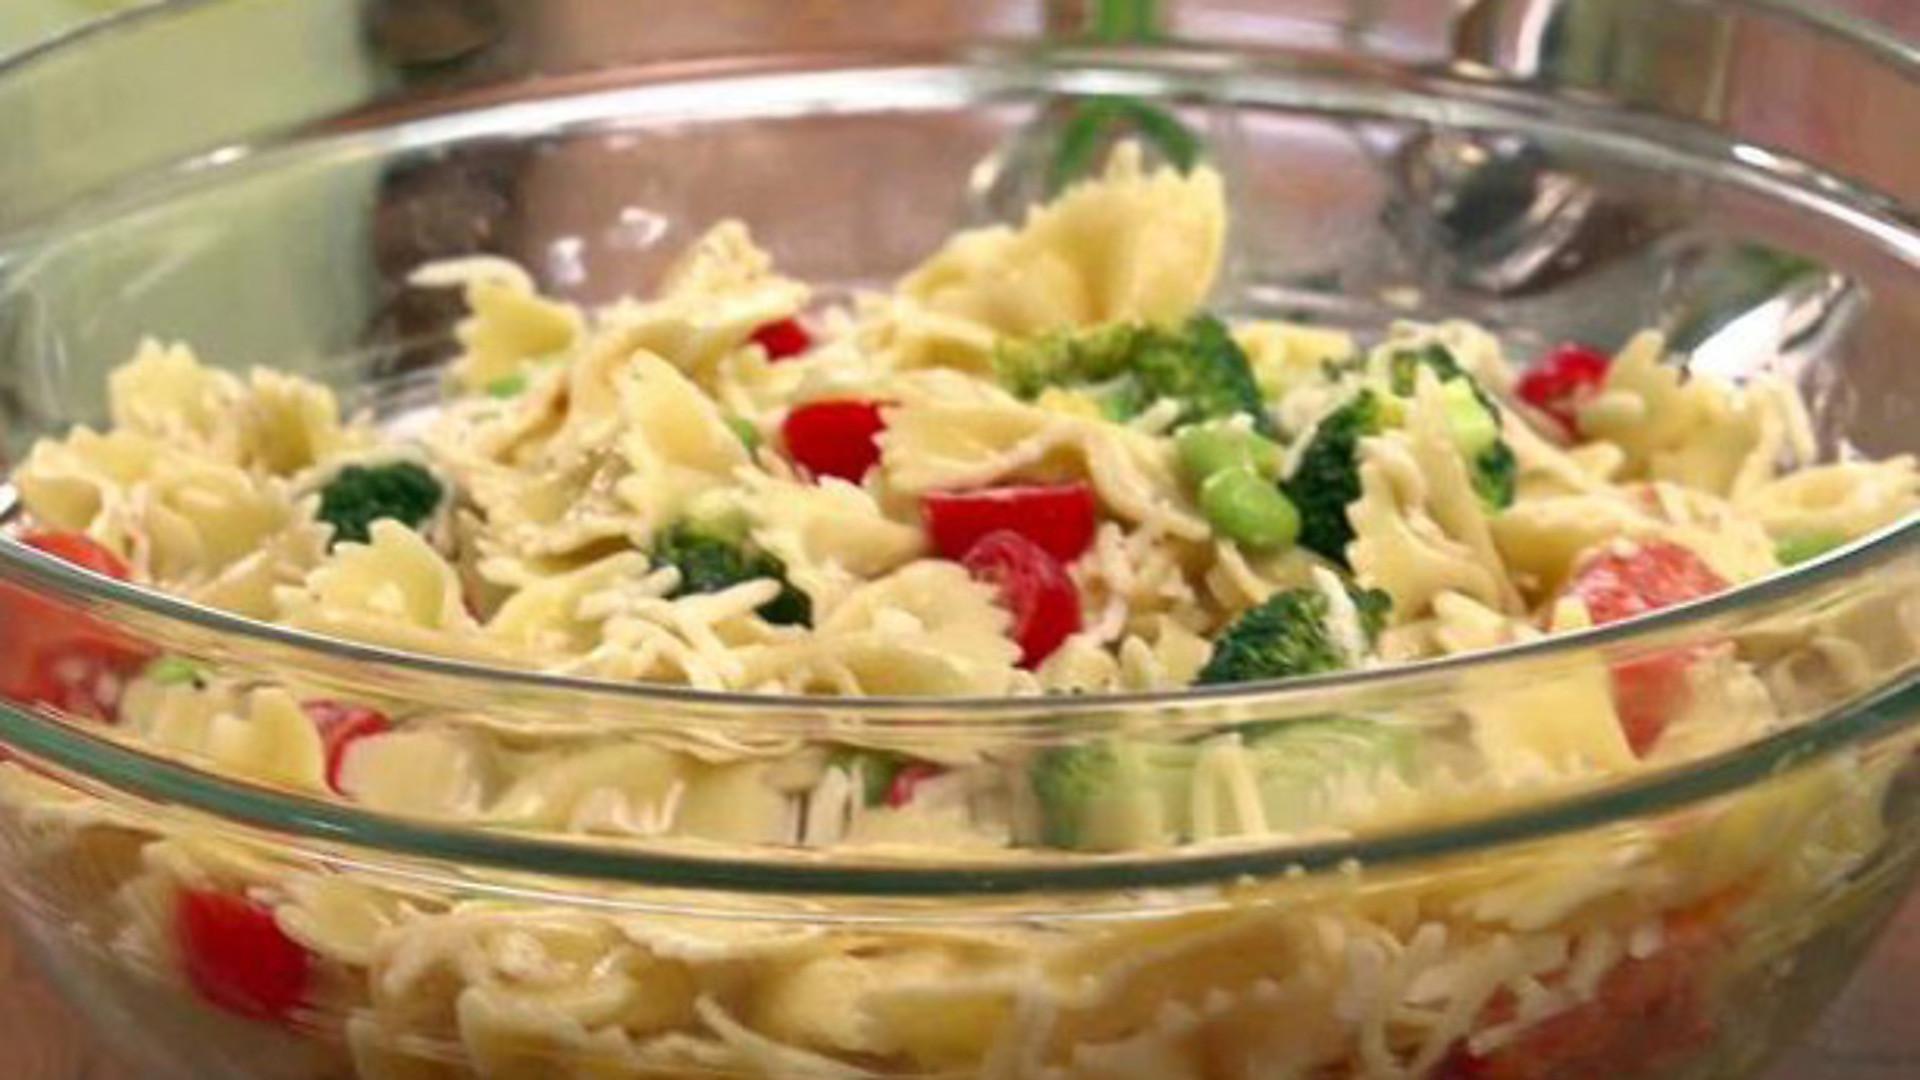 Ina Garten Pasta Salad  ina garten broccoli bow tie pasta